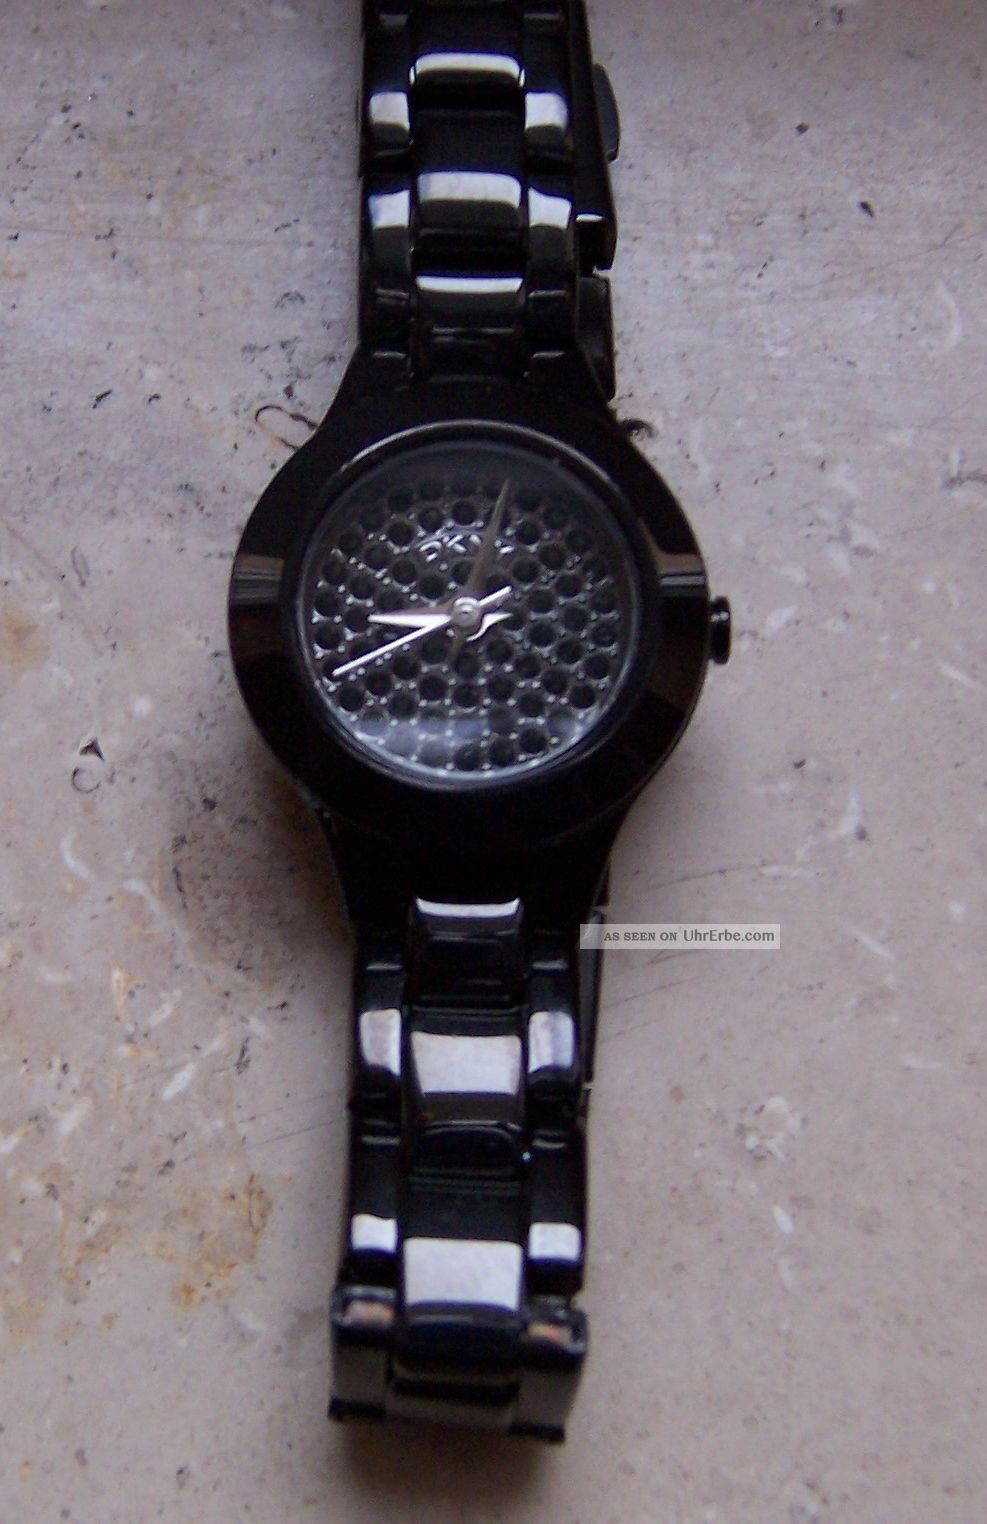 Dkny Ny8693 Armbanduhr Uhr Schmal Edelstahl Kristall Steine Schwarz Lp 179€ Armbanduhren Bild